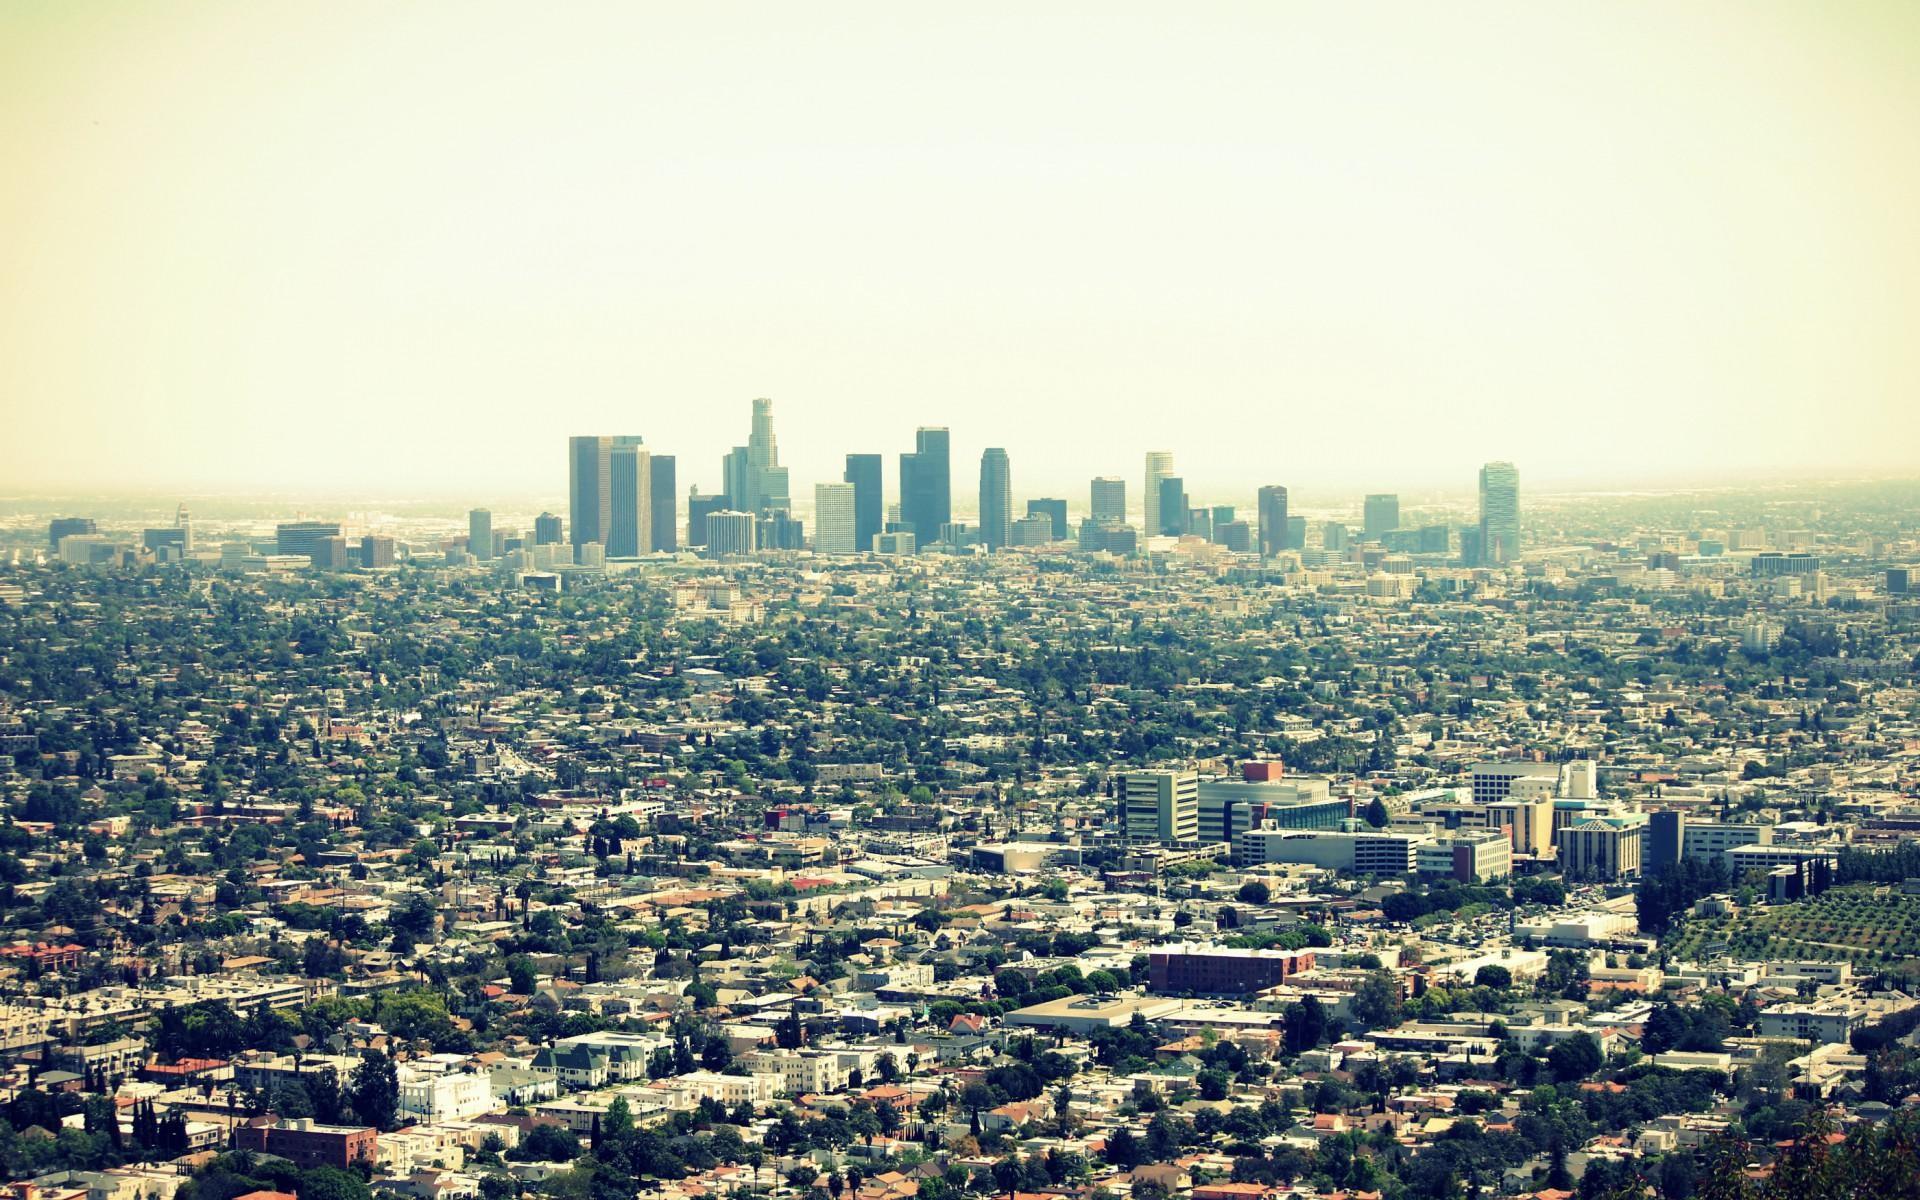 Usa California Los Angeles Cities Buildings Skyscraper Free wallpaper thumb